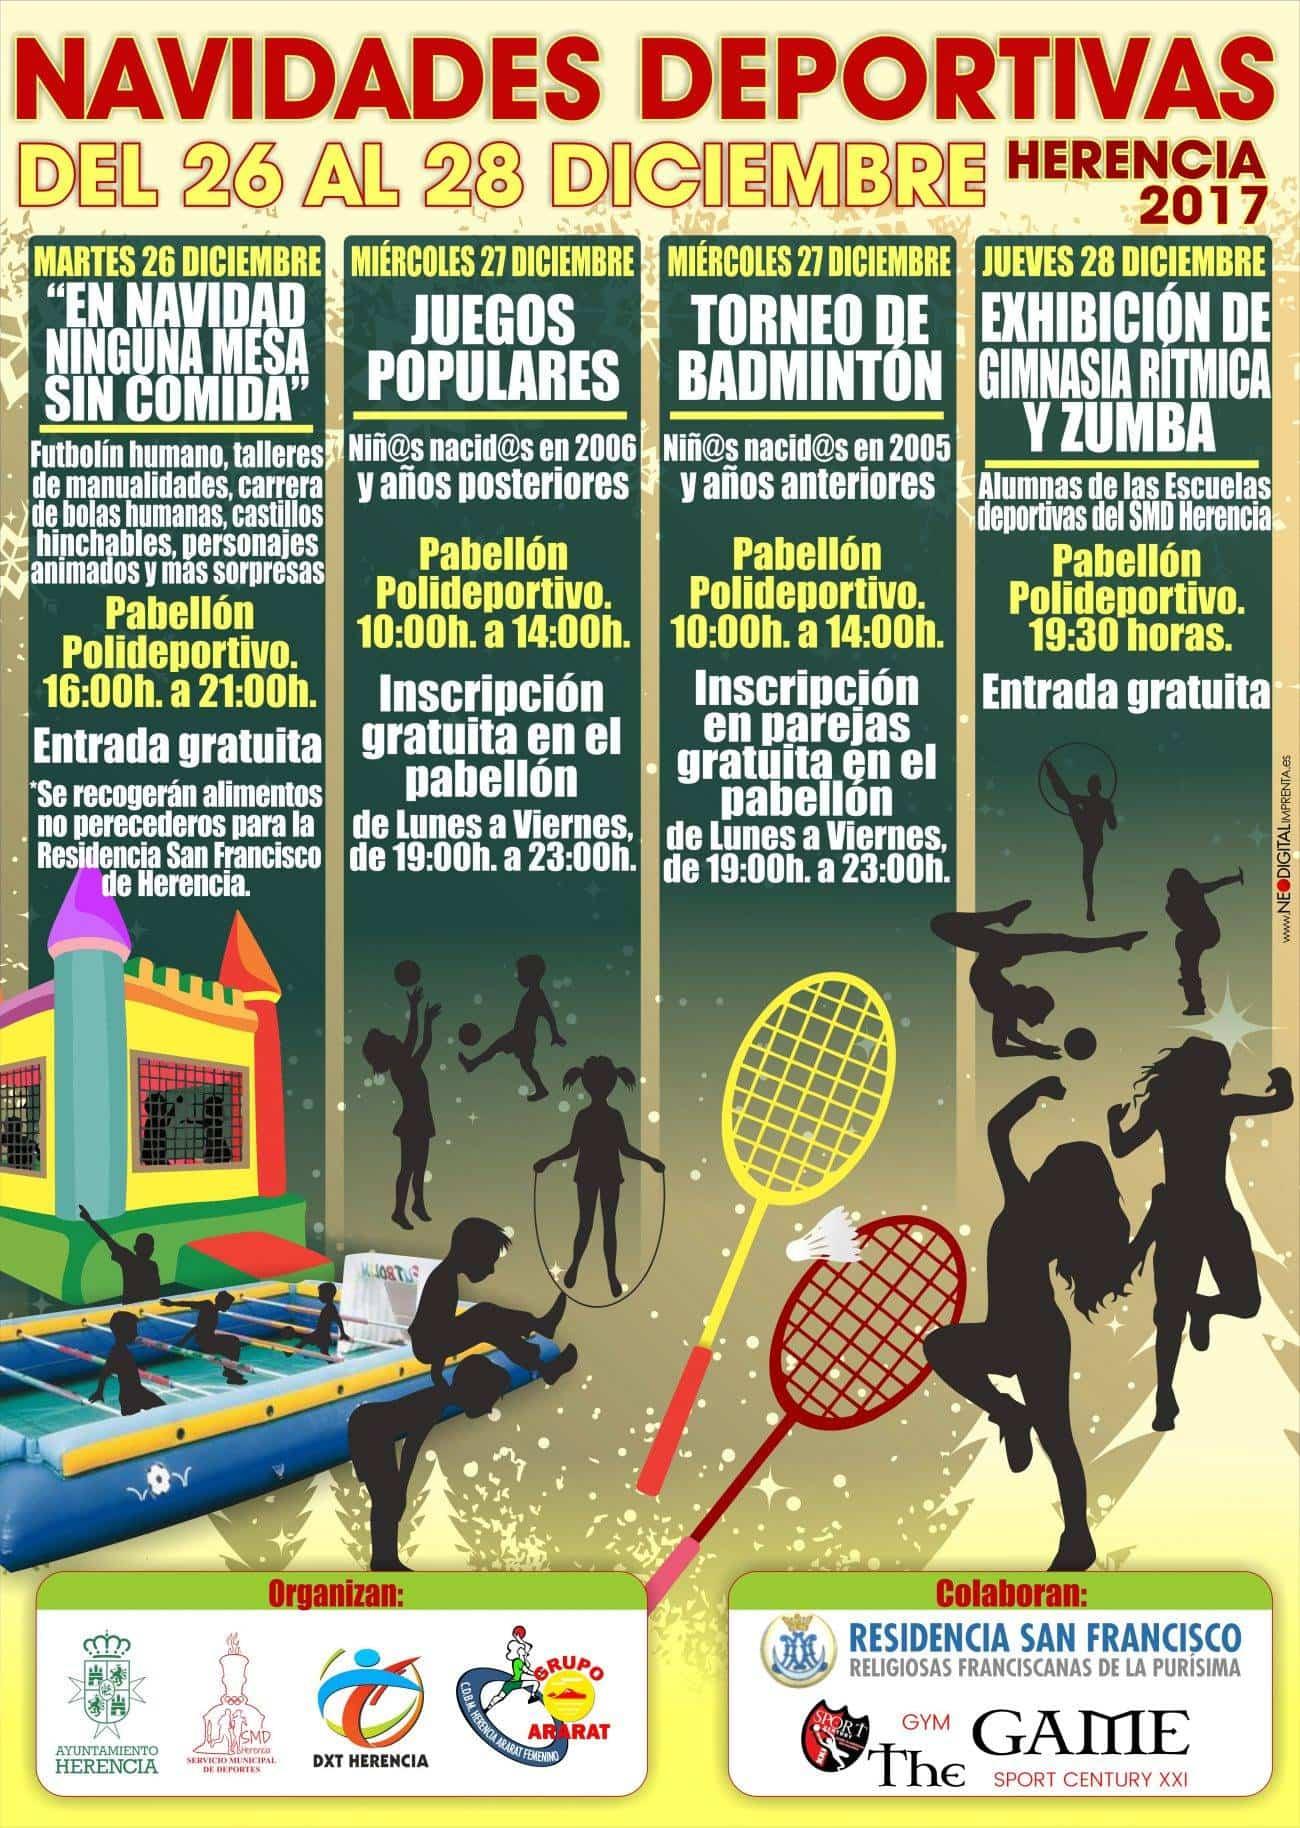 navidades deportivas herencia 2017 - Navidades deportivas en Herencia